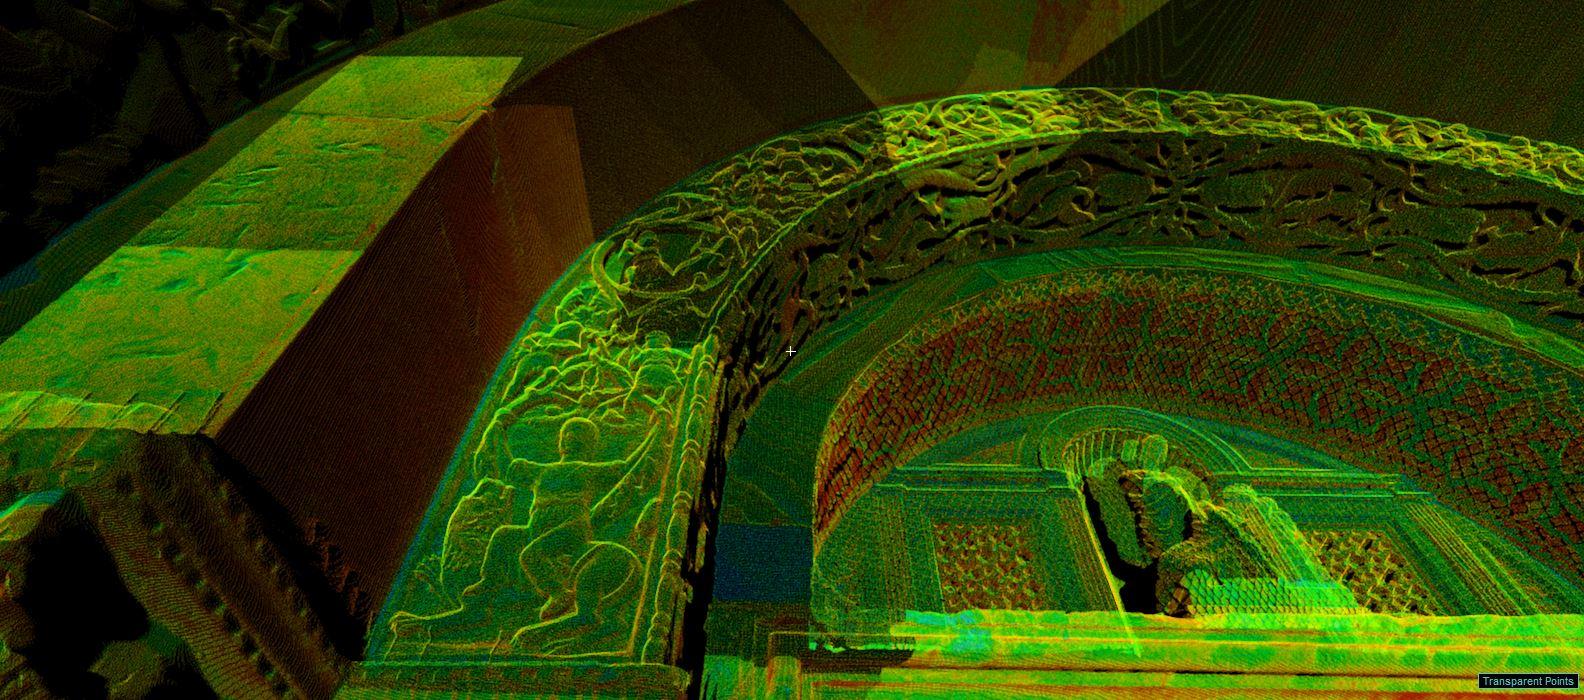 Venezia Basilica di San Marco-laser scanner-modellazione 3Db X.JPG